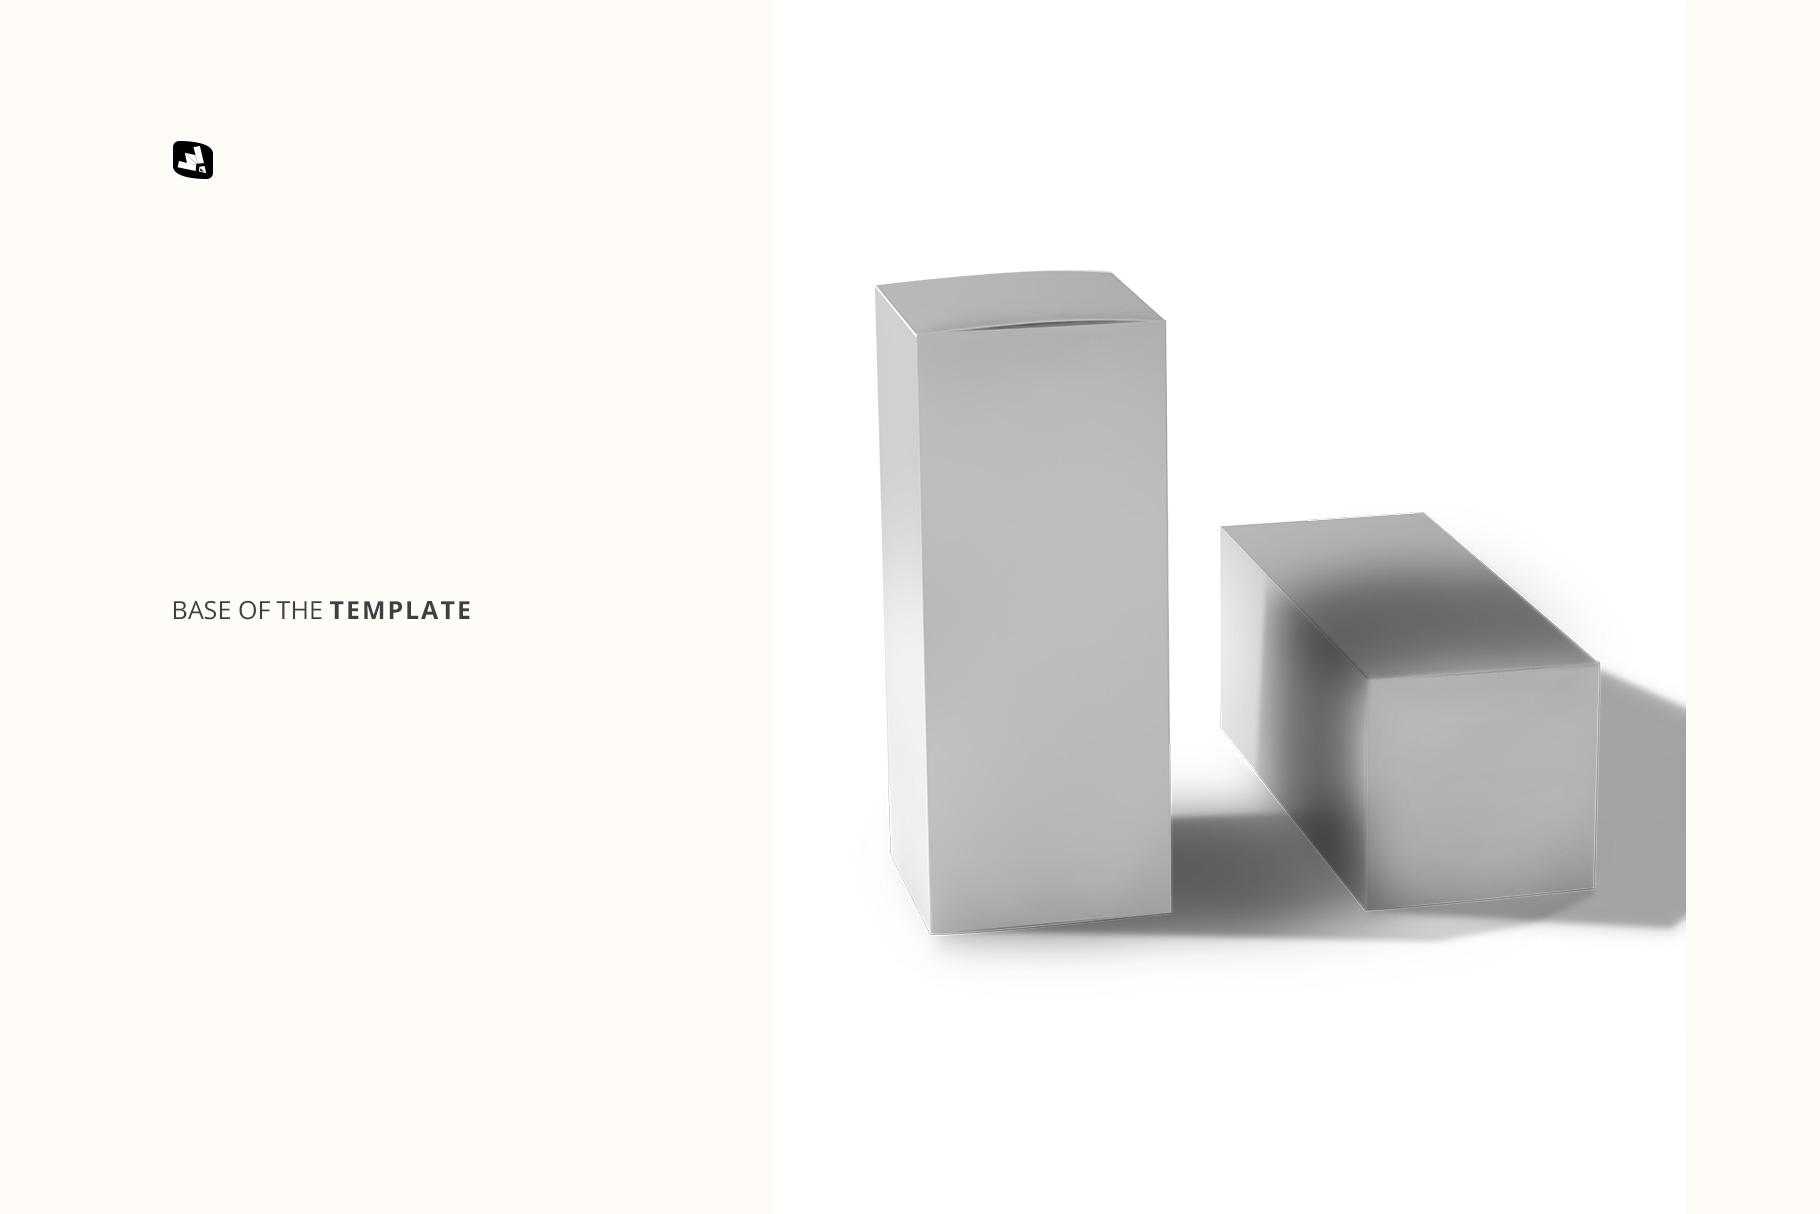 base image of the set of tall box packaging mockup